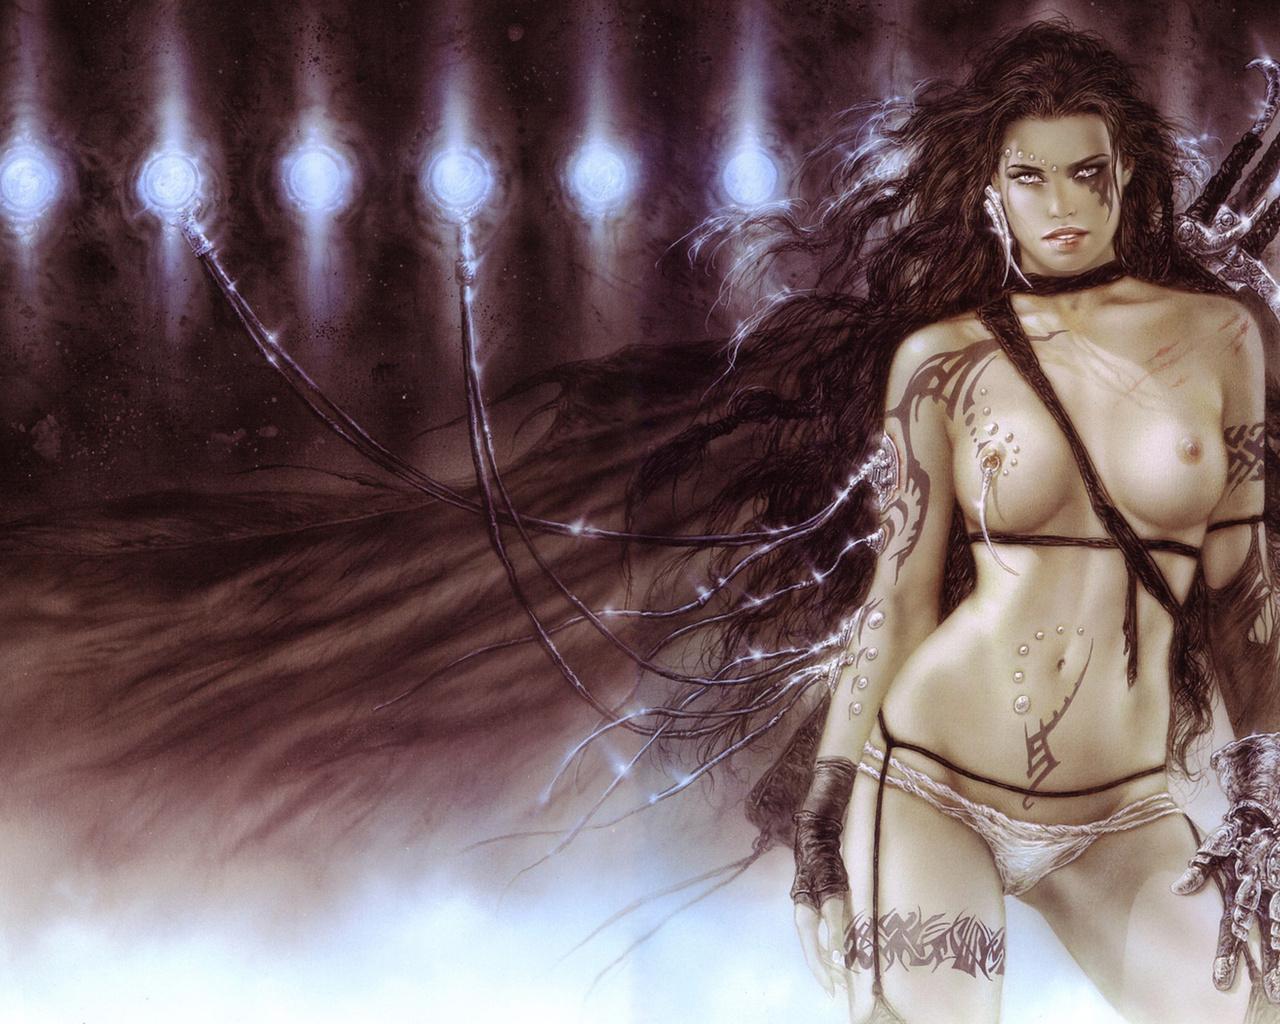 девушка, тату, меч, фентези, поза, стойка, взгляд, грудь, провод, цепи, провода, наручи, голая